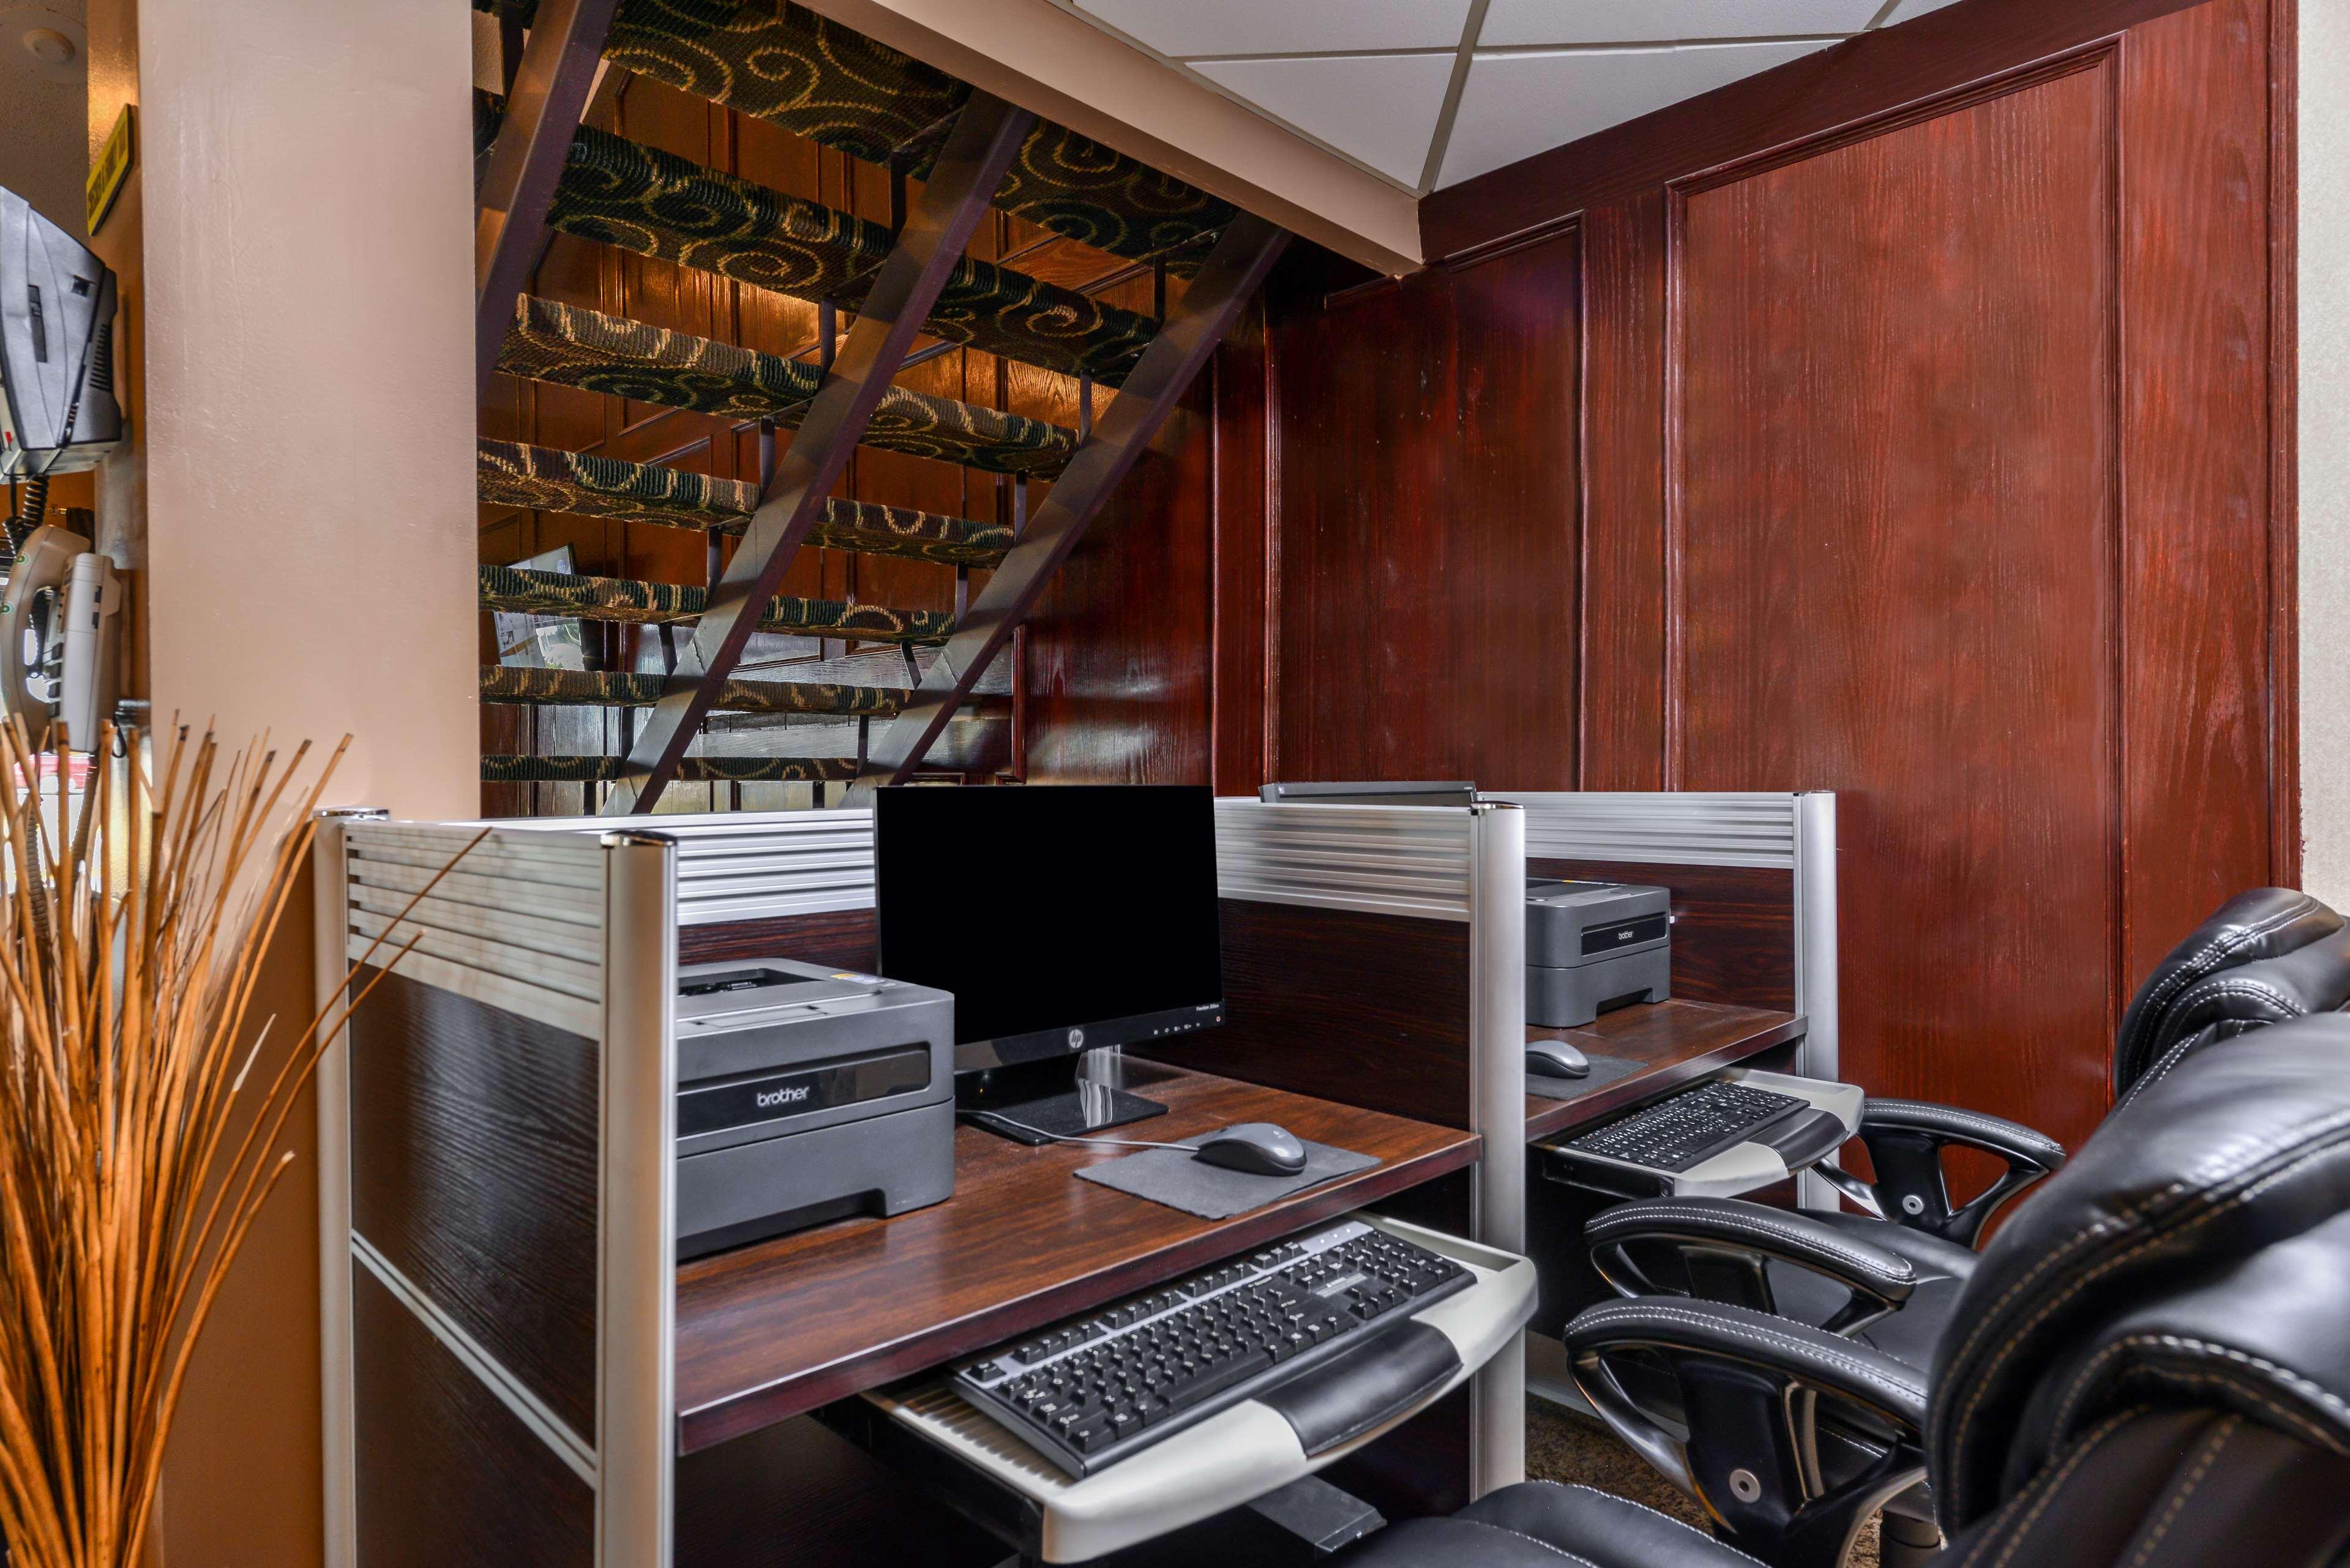 Best Western Marquis Inn & Suites in Prince Albert: Business Center